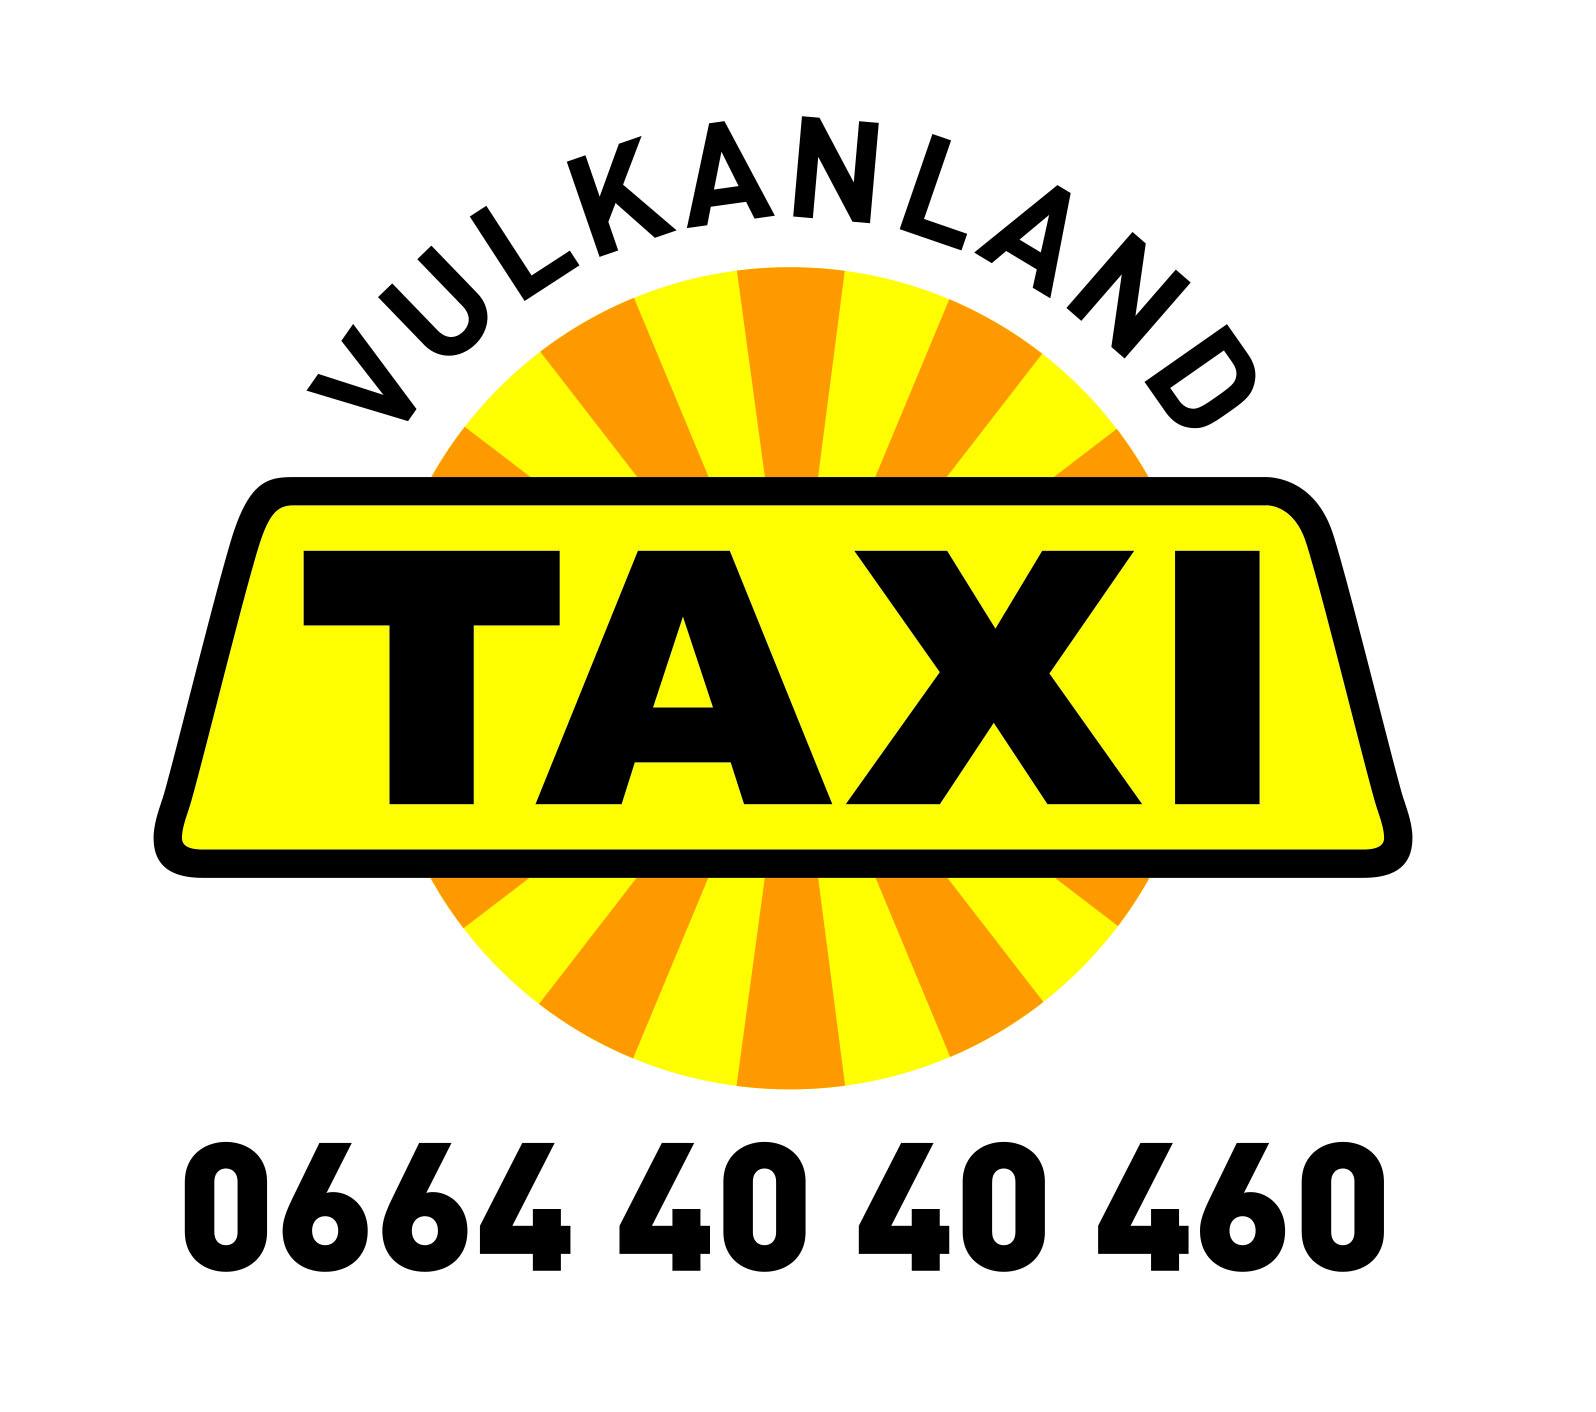 VL-Taxi-Marke-OK-neu